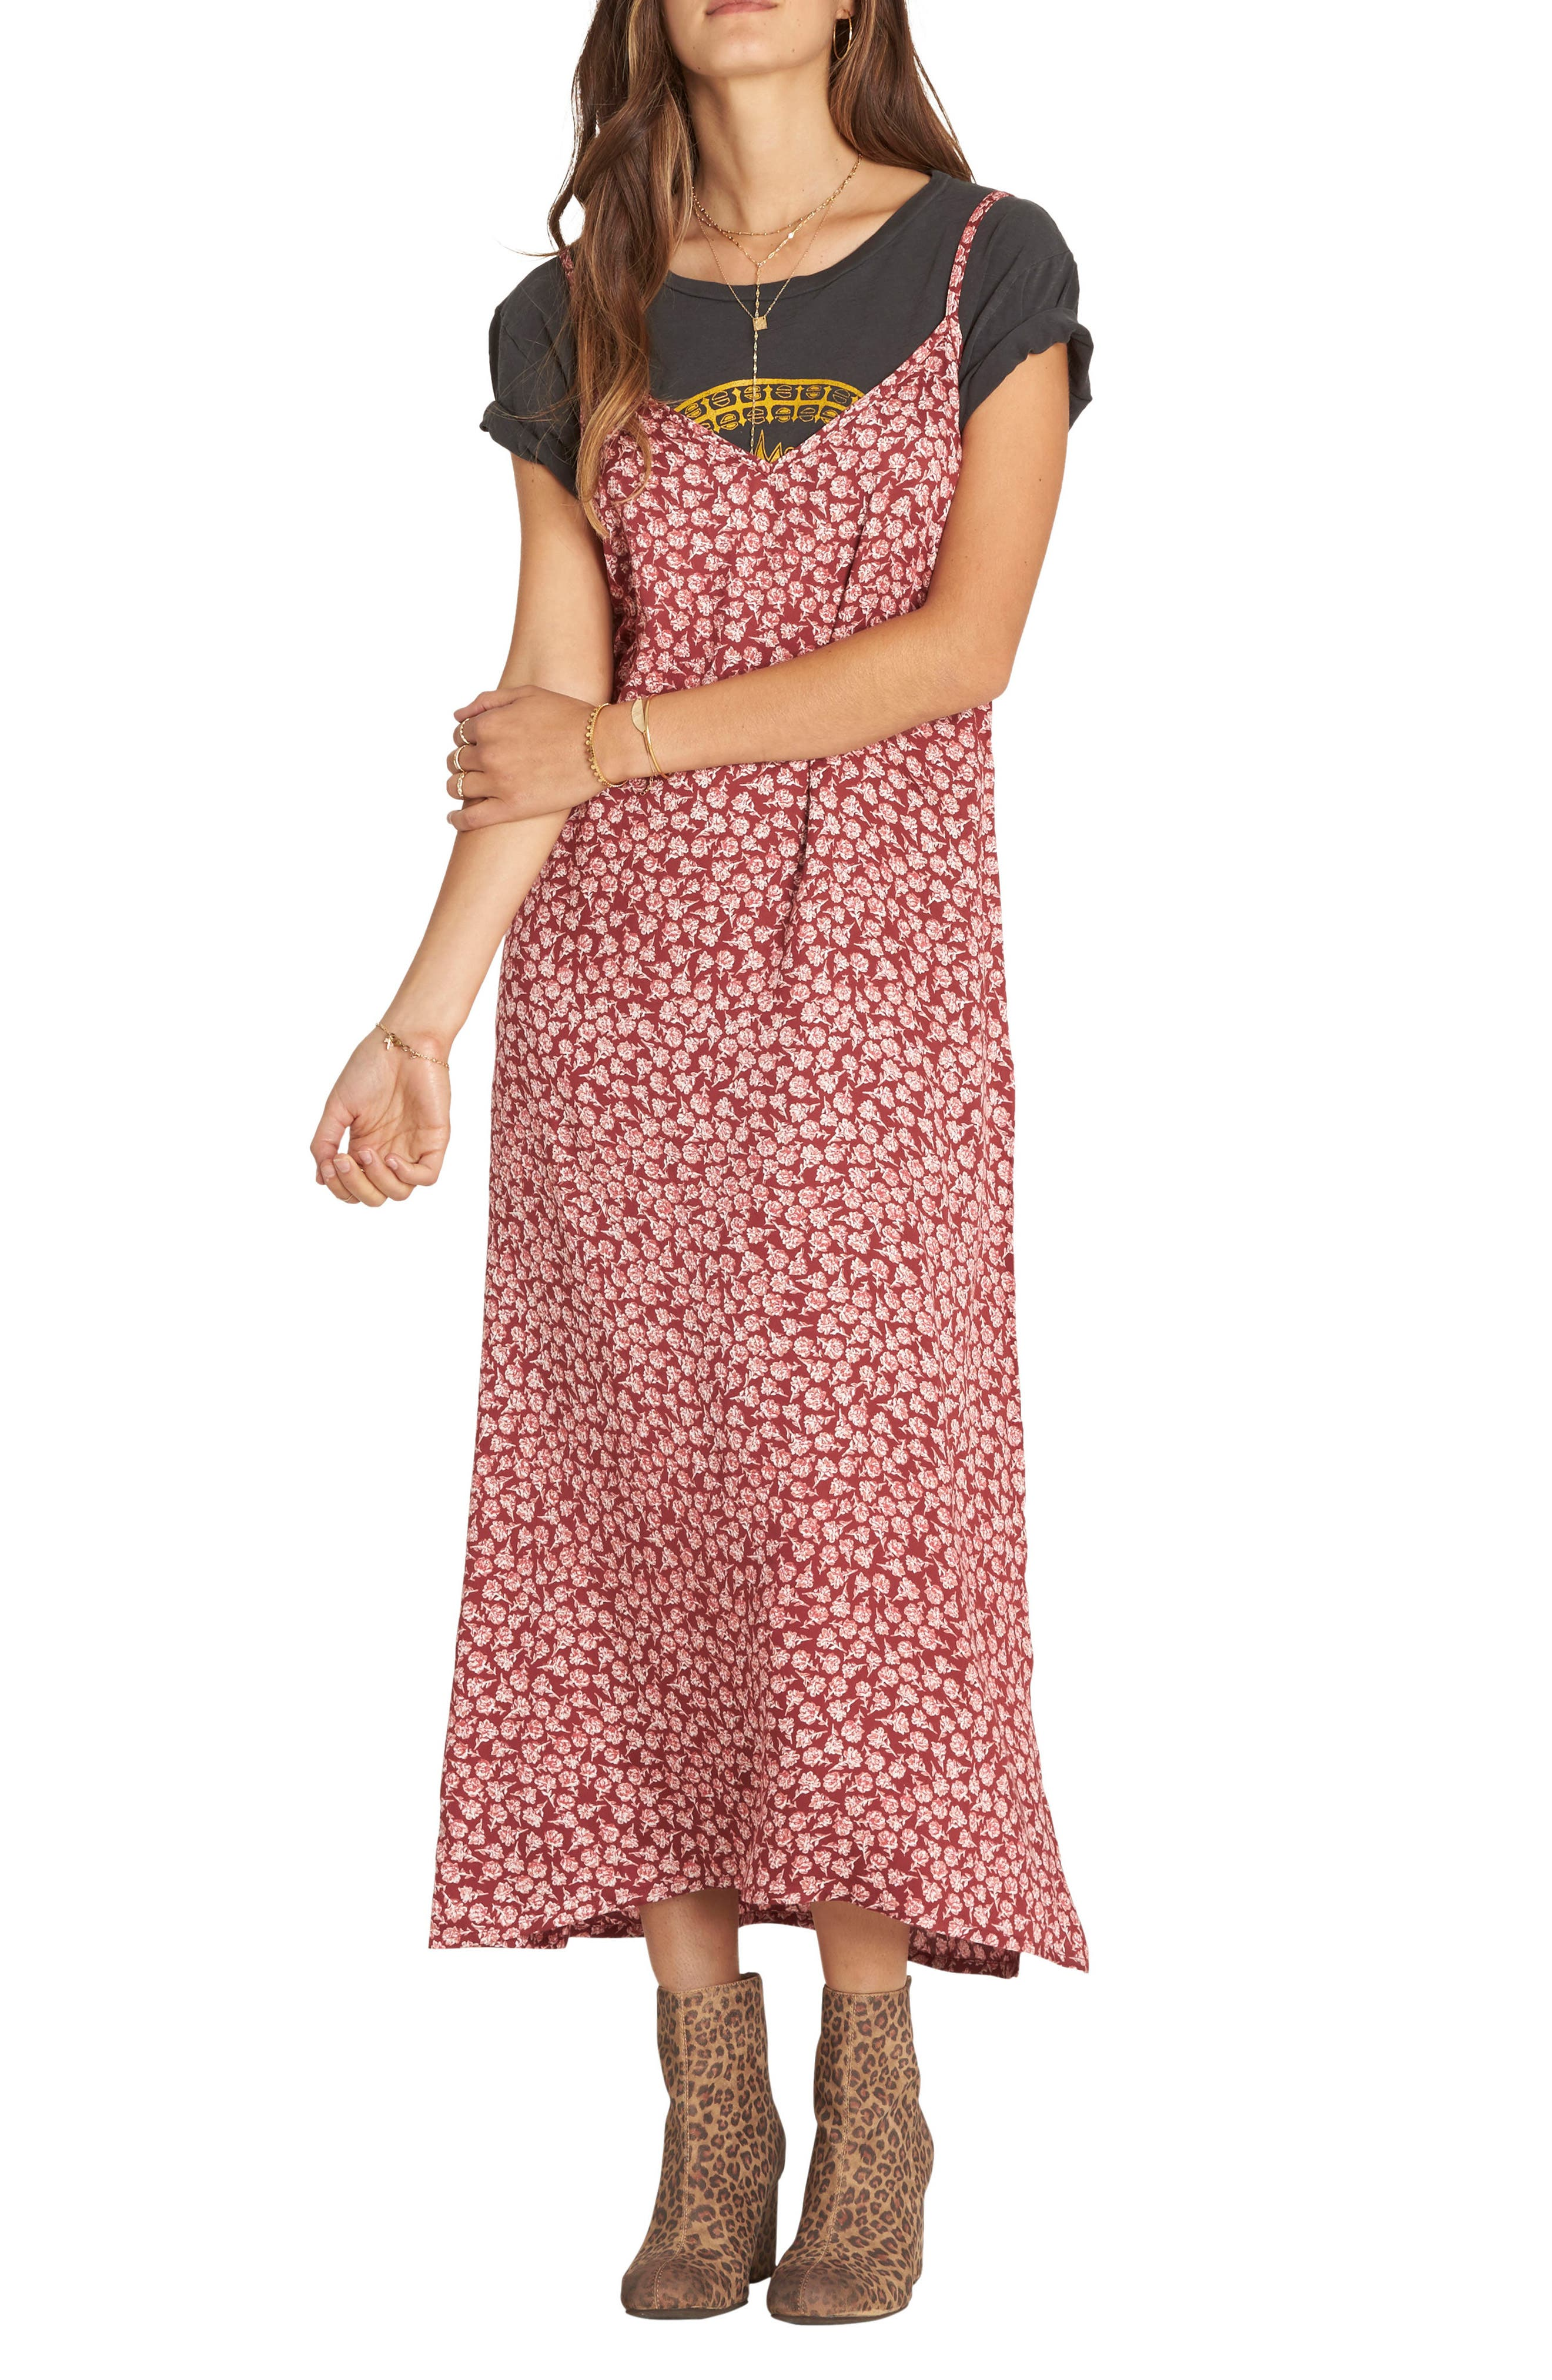 Dreamy Garden Print Dress,                         Main,                         color, 002